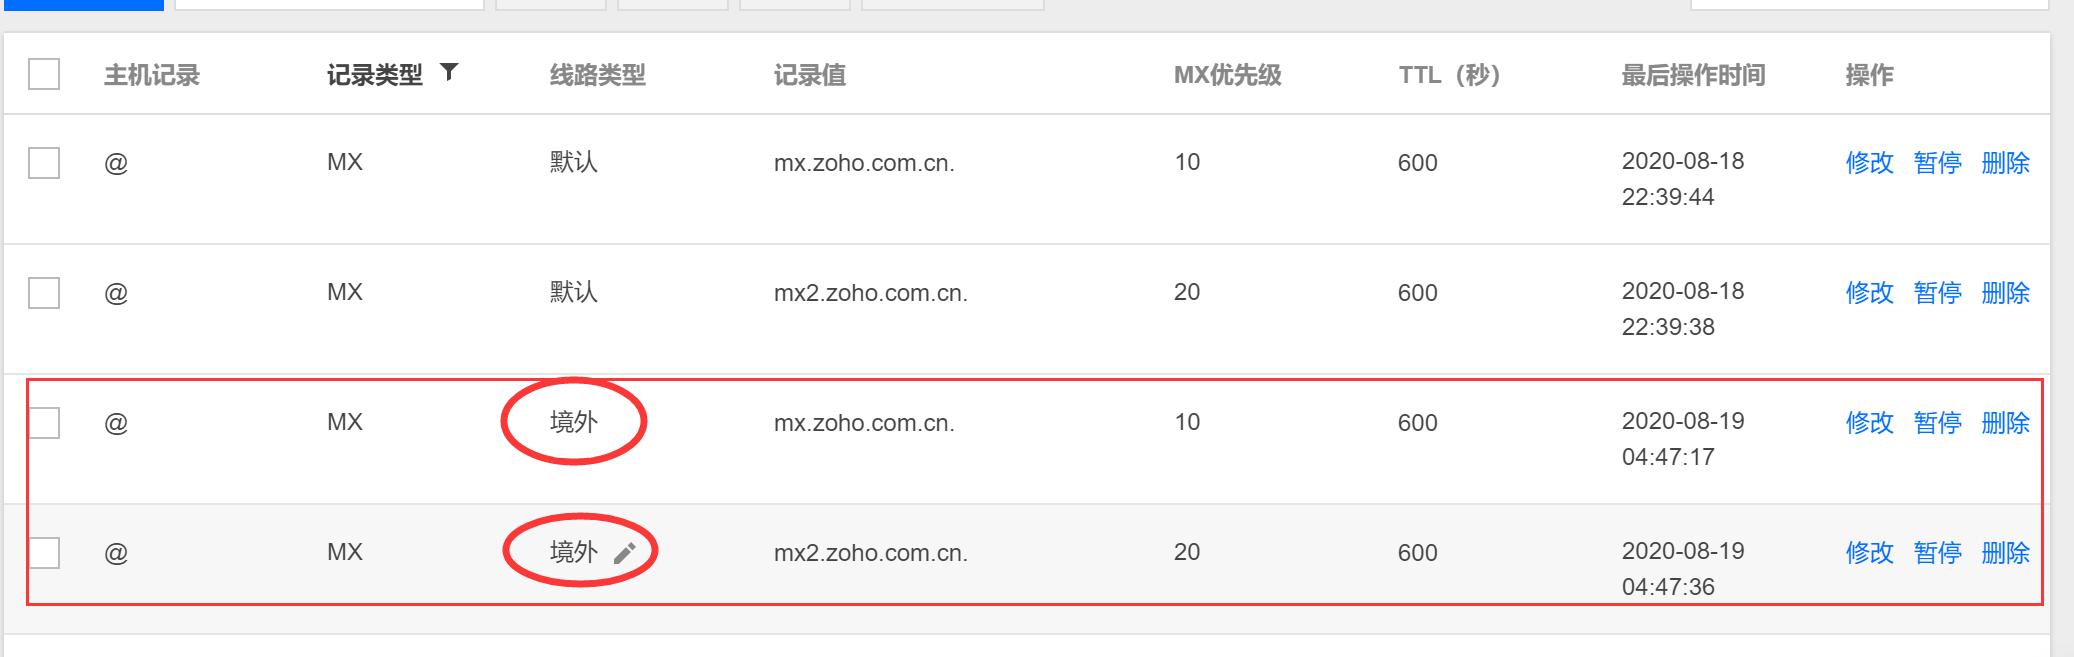 DNSPod配置域名邮箱DNS解析CNAME+MX的坑